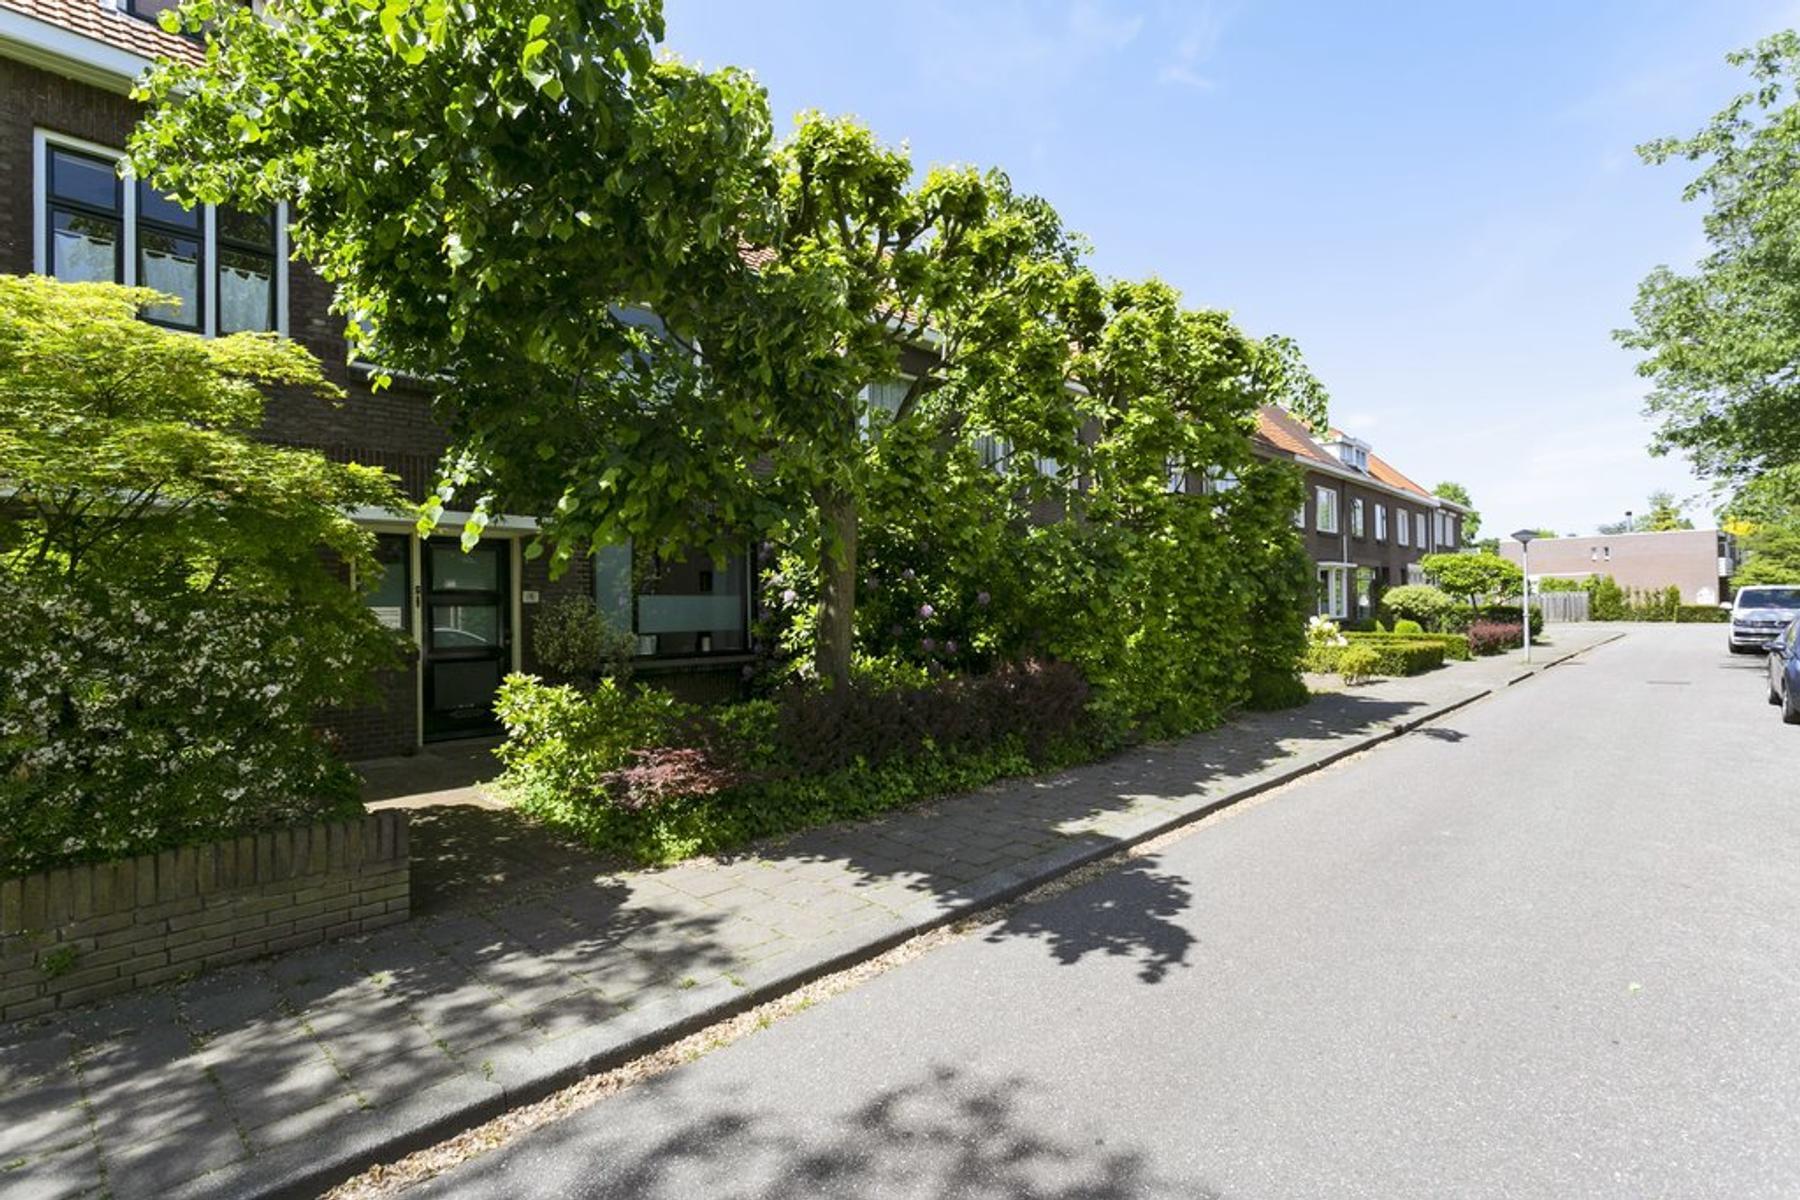 Frederik Hendrikstraat 13 in Waalre 5583 CL